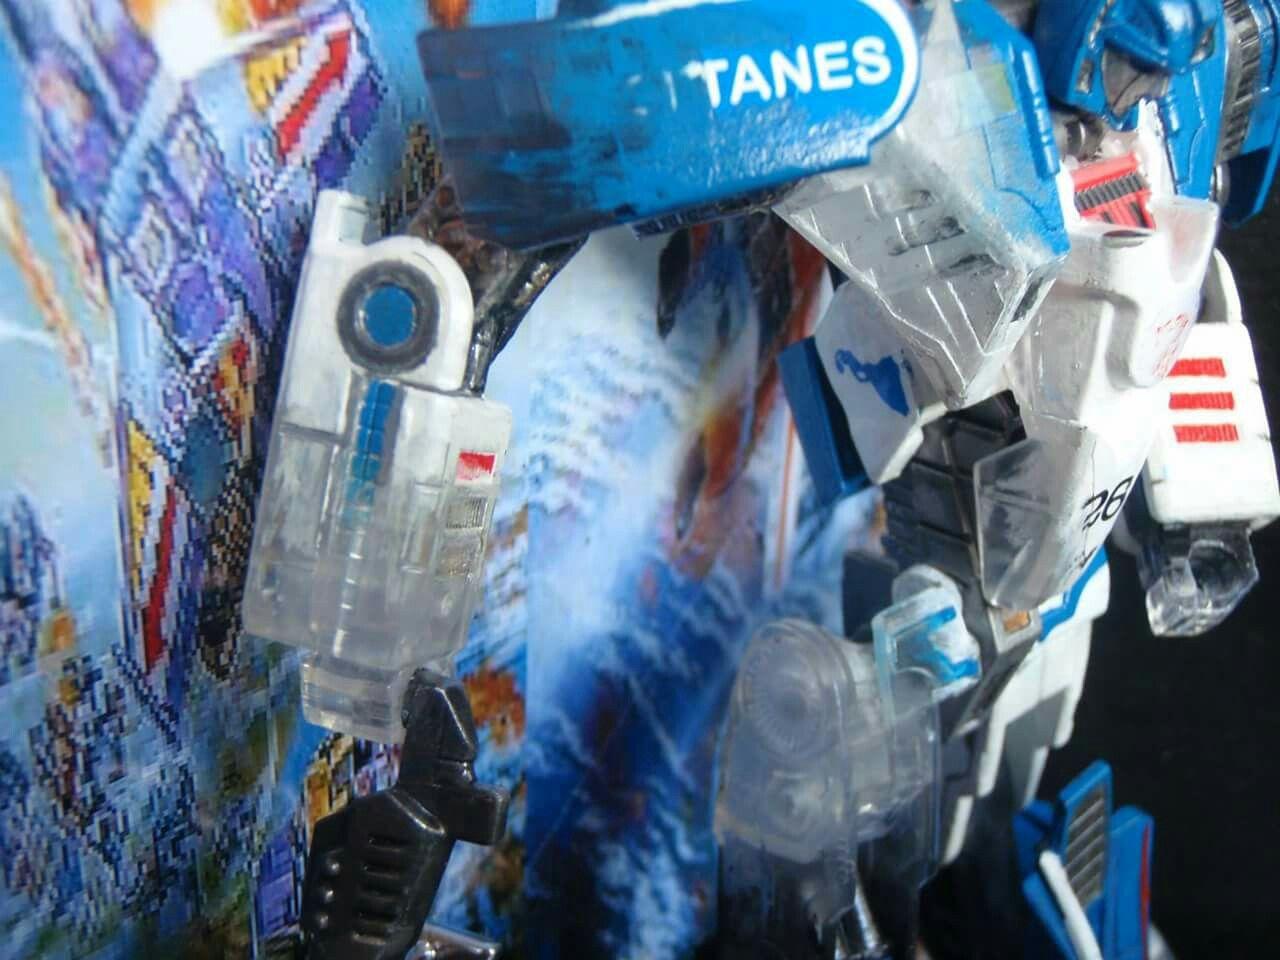 #custranz Mid-electro disruption Mirage arm #detail #customdecals #handpainted #customtransformer #transformers #autobot #creative #designer #aimhigh